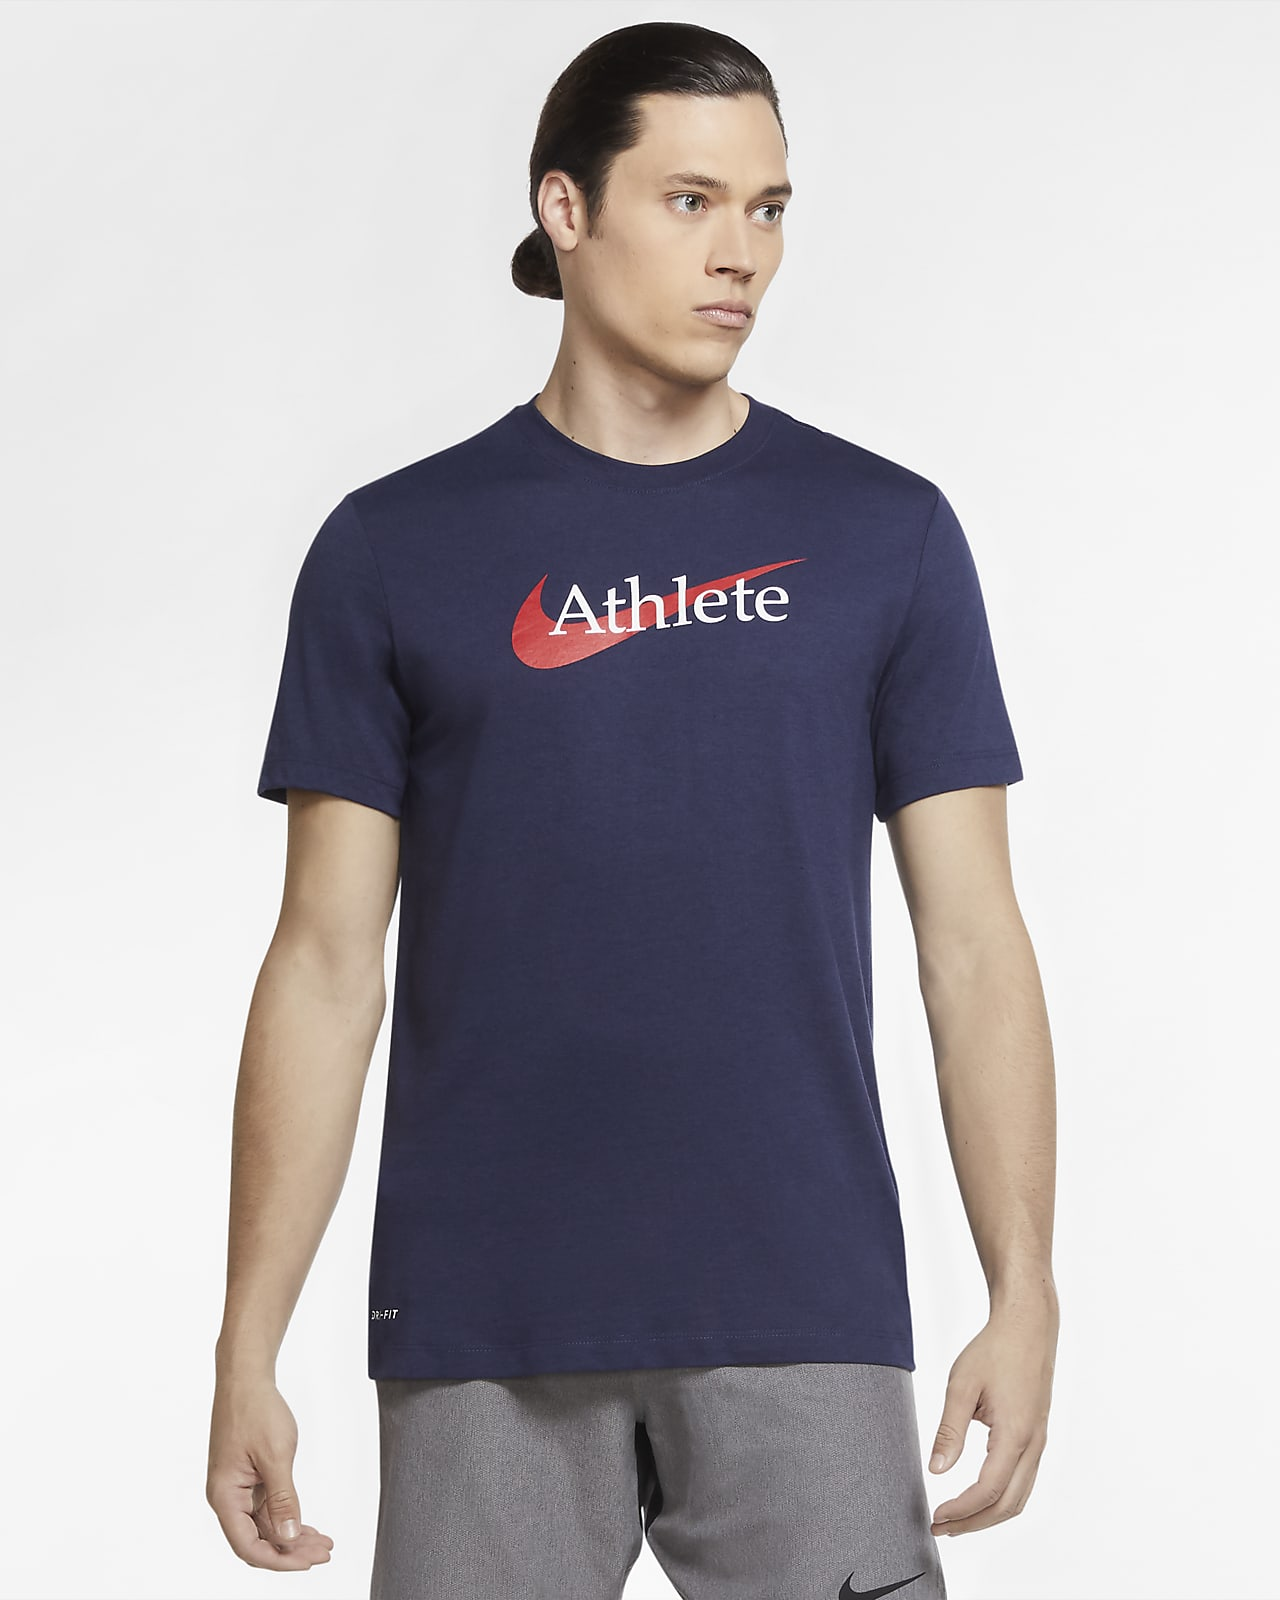 Pánské tréninkové tričko Nike Dri-FIT s logem Swoosh